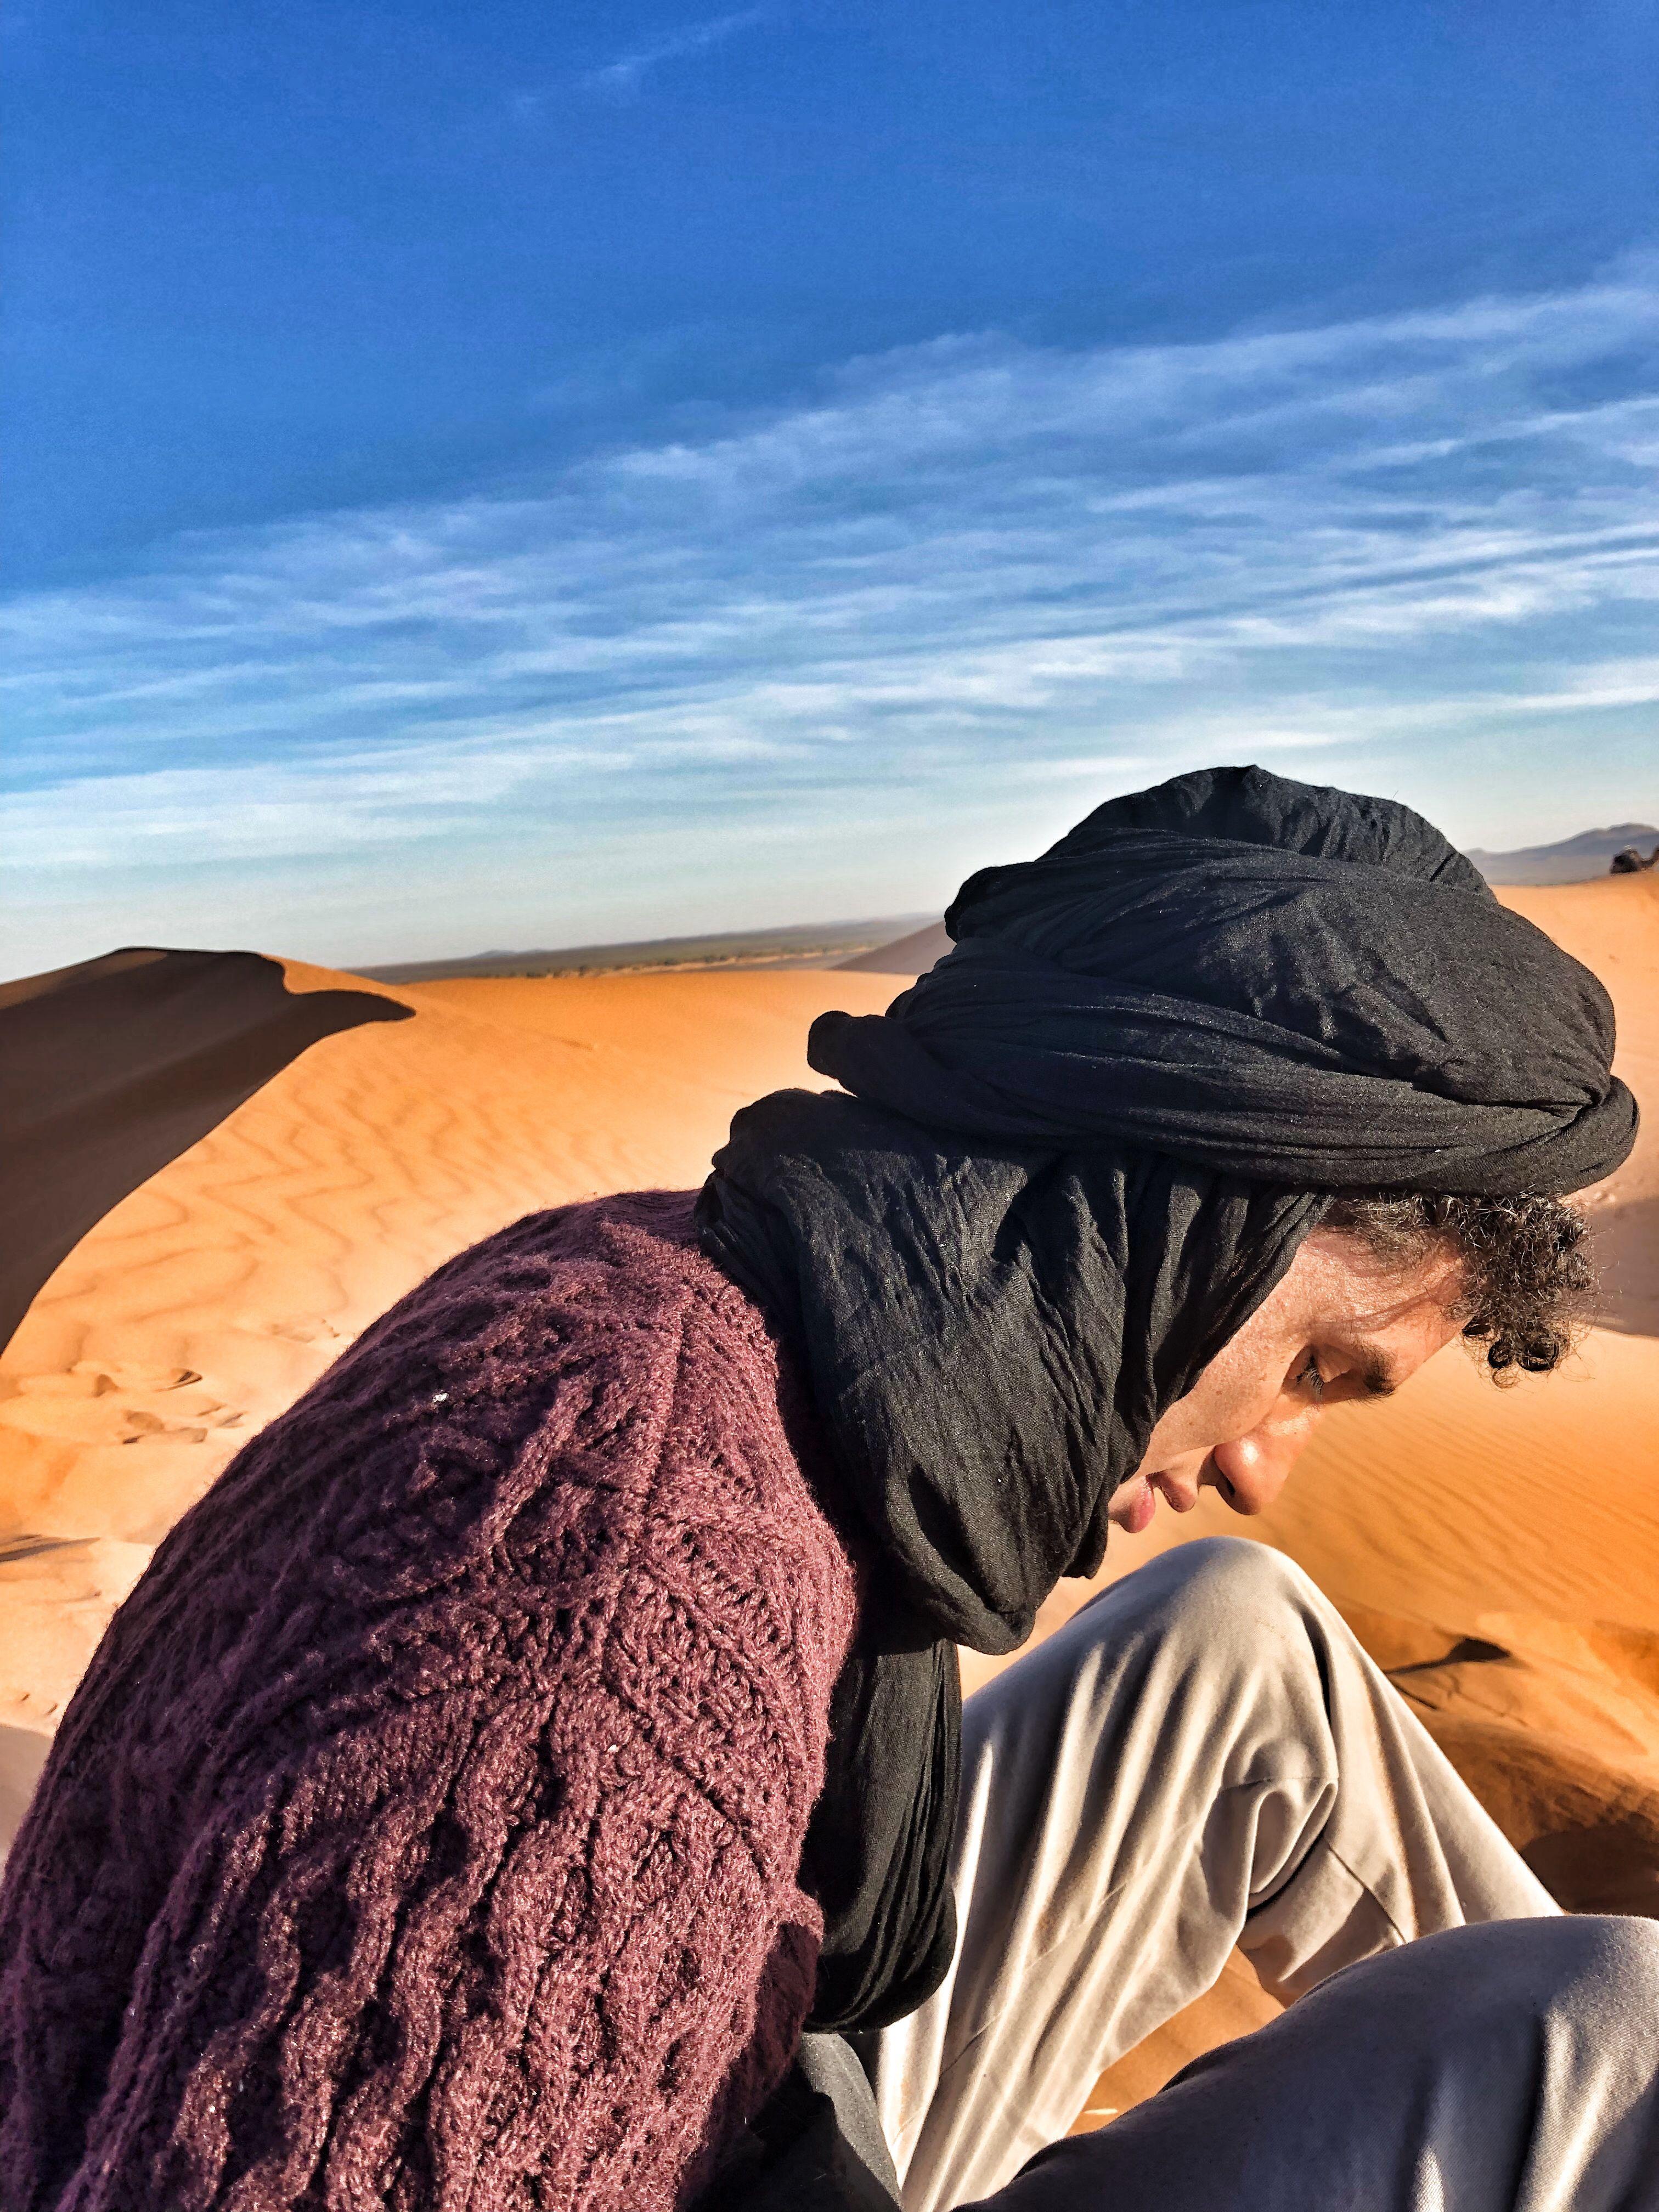 Marokkoreisen Marokkokleidung Marokkodeko Marokkophotographie Marokkobilder Marokkomalen Marokkoeinrichtu Marokko Reisen Marrakesch Marokko Marokko